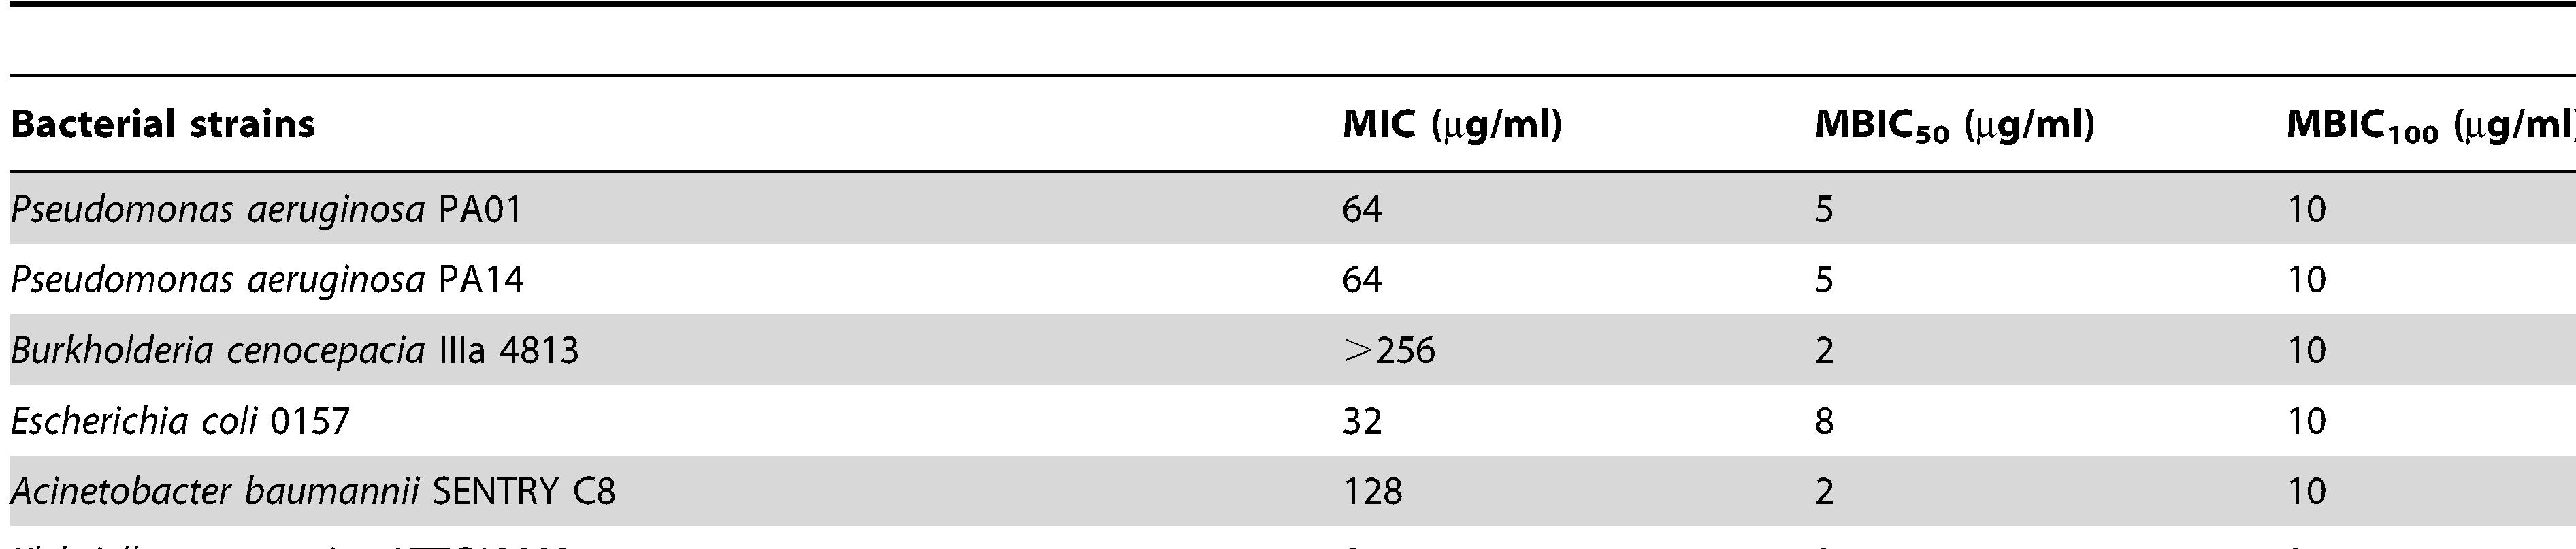 Peptide 1018 exhibited potent broad-spectrum direct anti-biofilm activity but weak antibacterial activity for planktonic cells.